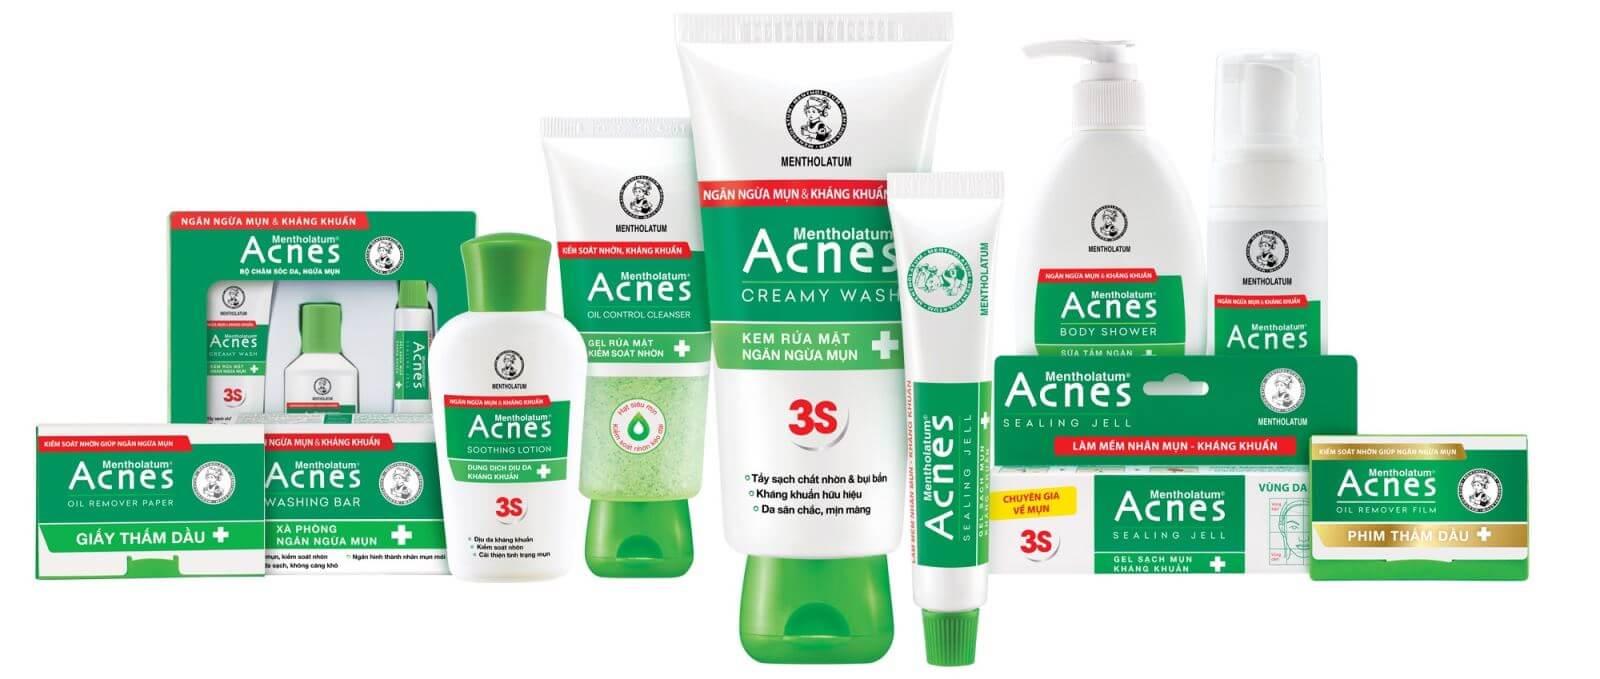 nhan hang acnes, thuong hieu acnes, acnes tri mun, san pham acnes